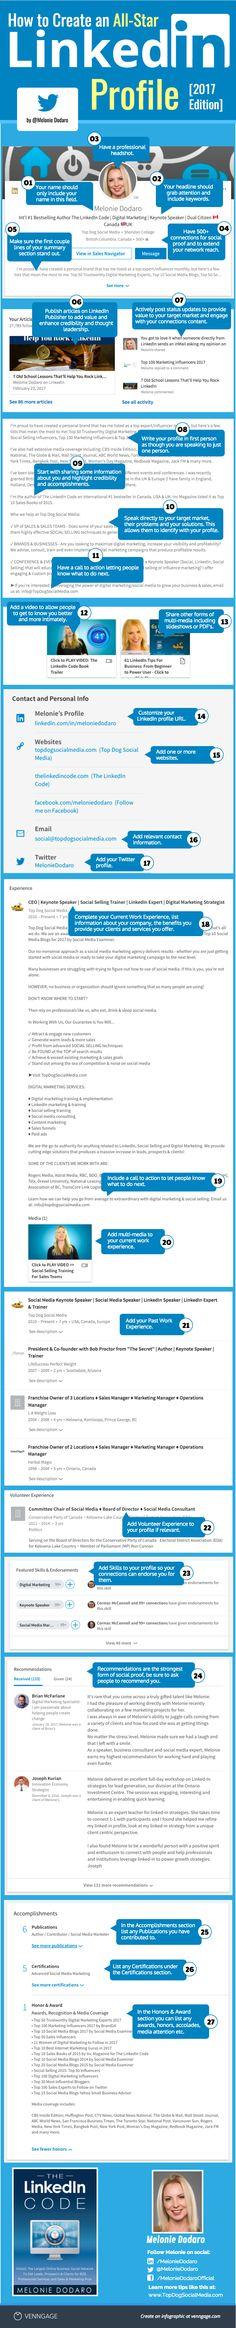 How to Create an All-Star #LinkedIn Profile #Infographic #SocialMedia